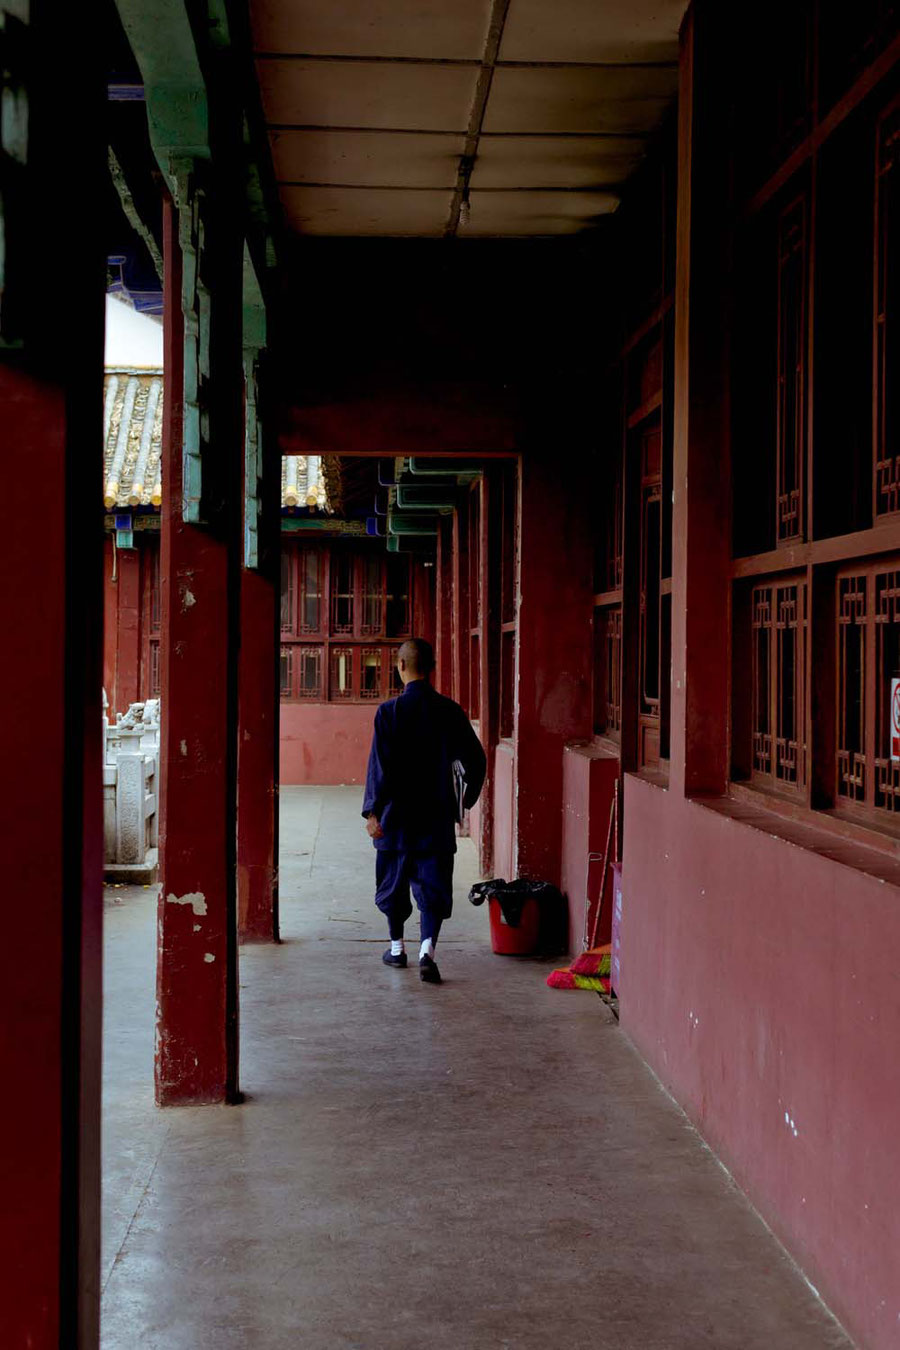 Die Mönche hier in Südchina sind so anders angezogen als die in Tibet, Kunming, China